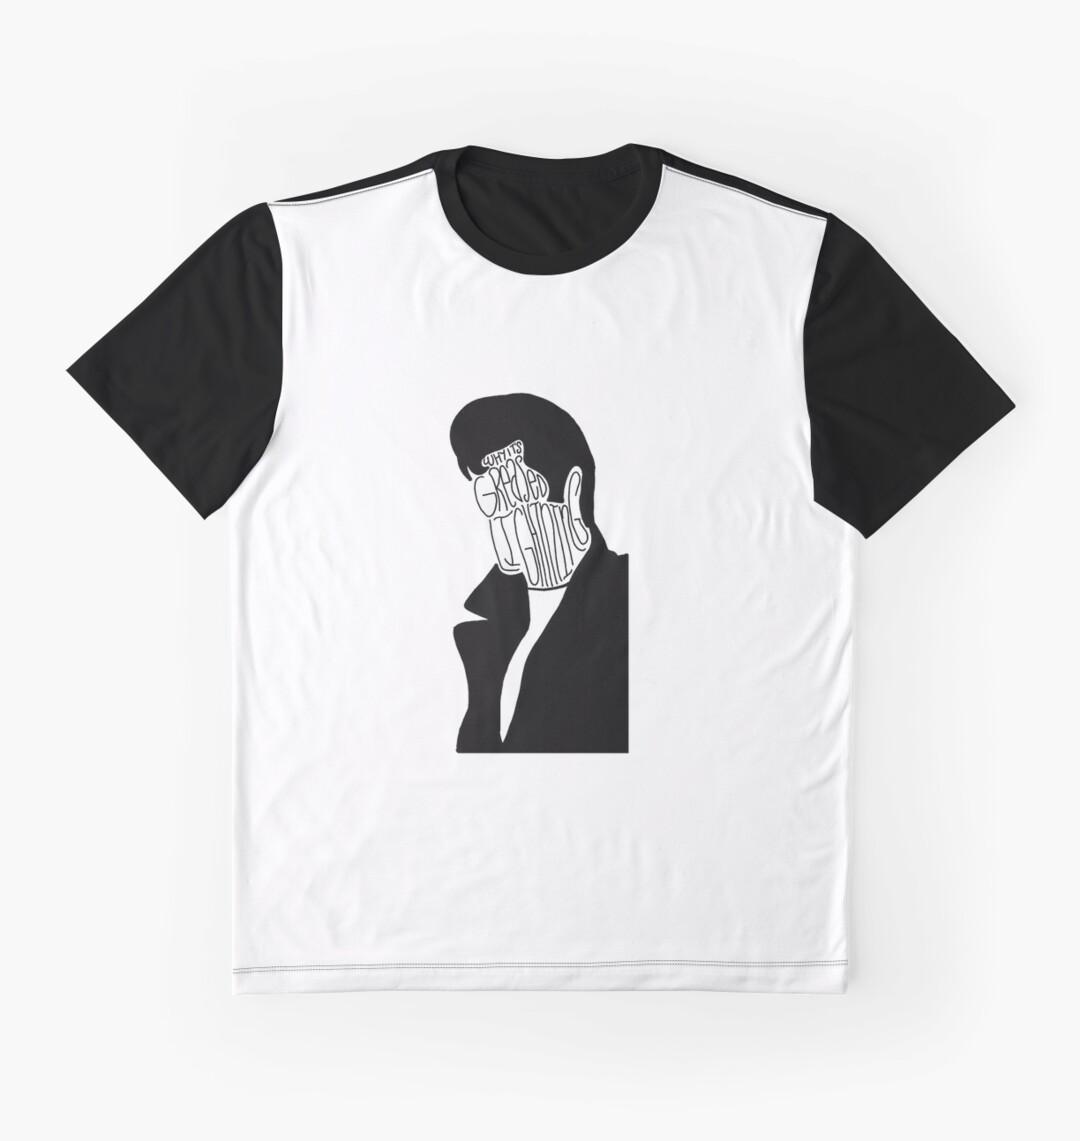 Danny zuko black t shirt - Danny Zuko Greased Lightning Graphic T Shirts